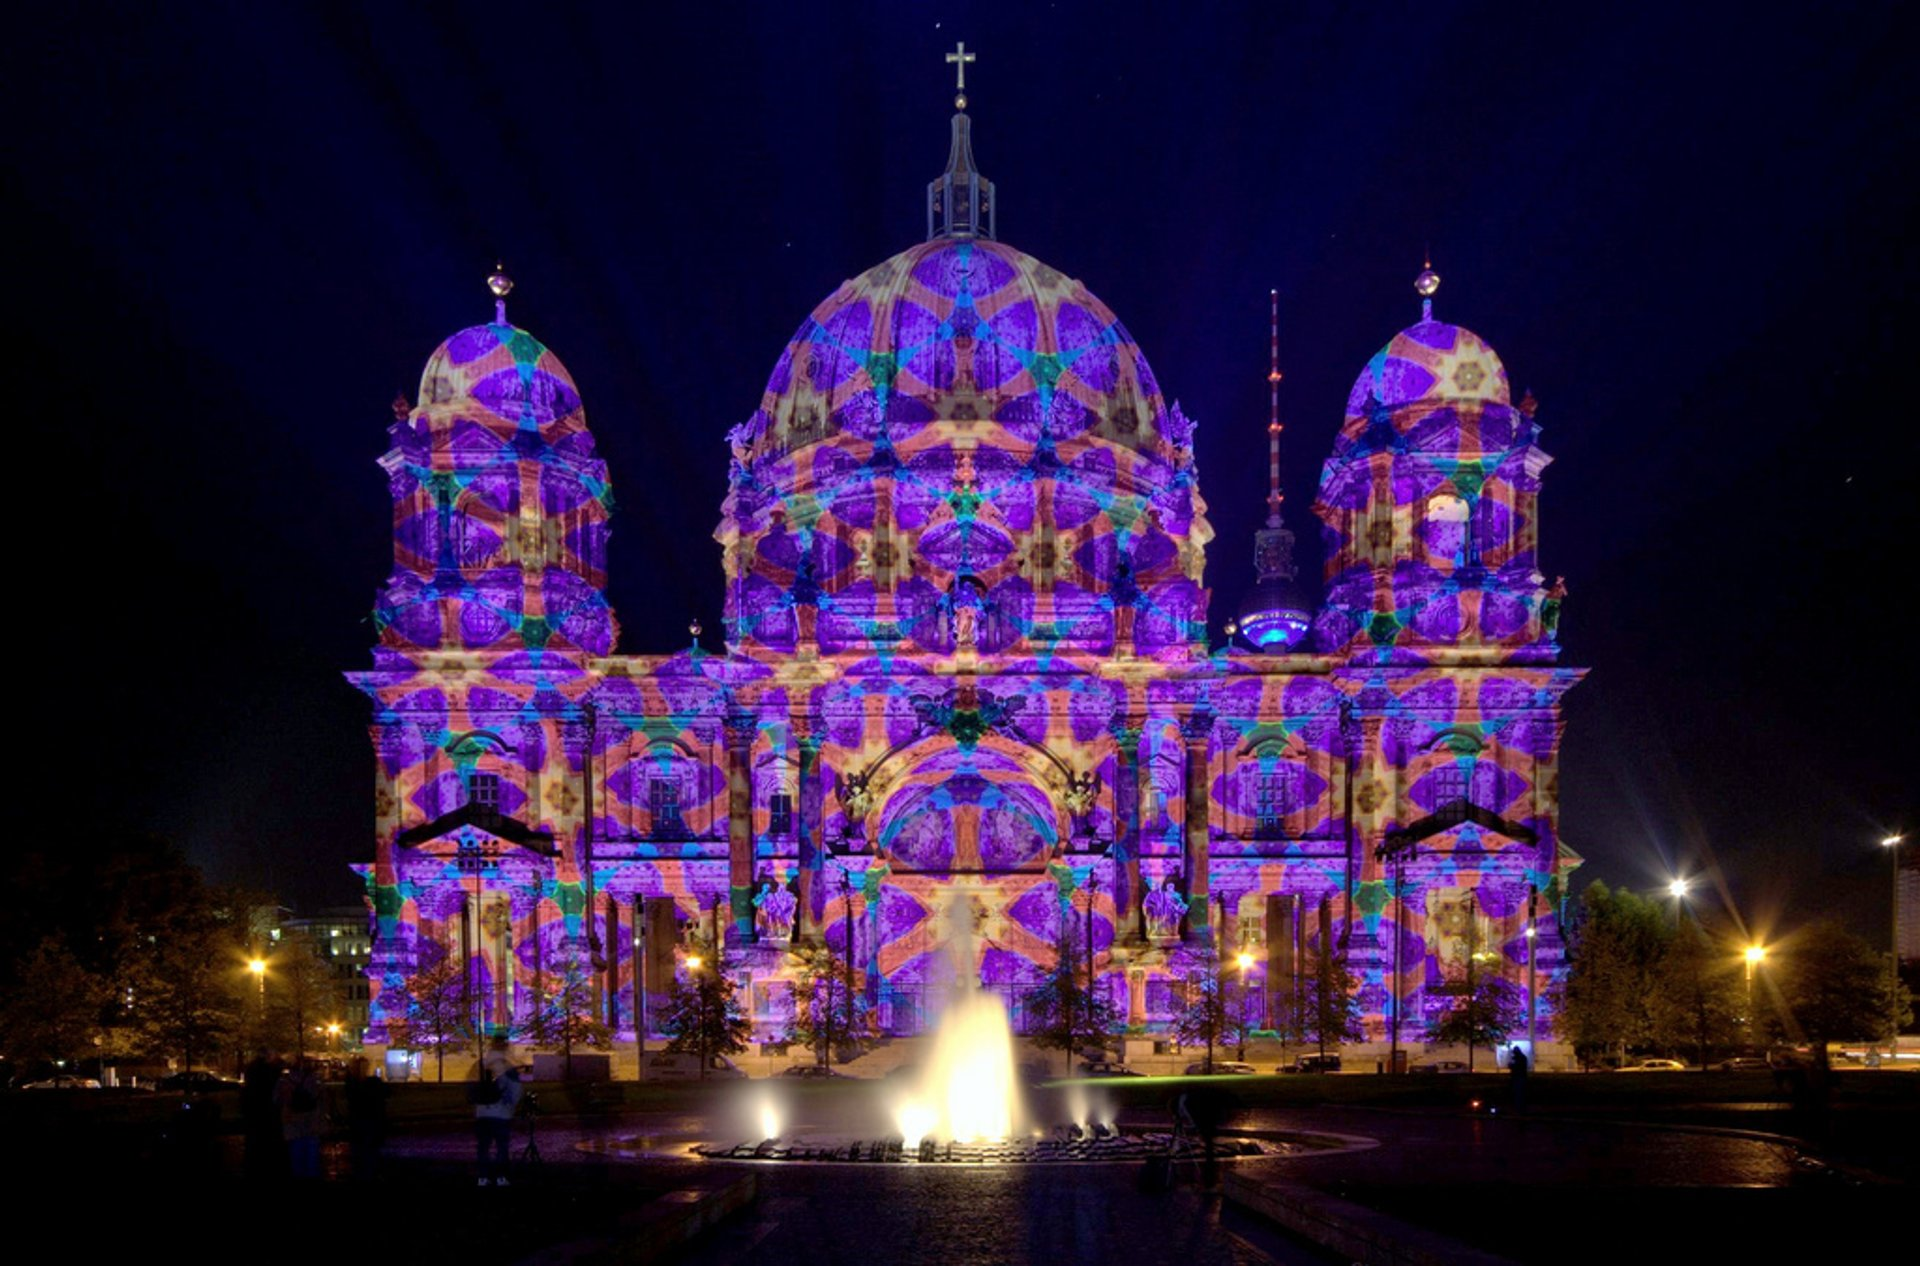 Berlin Festival of Lights 2020 - Dates